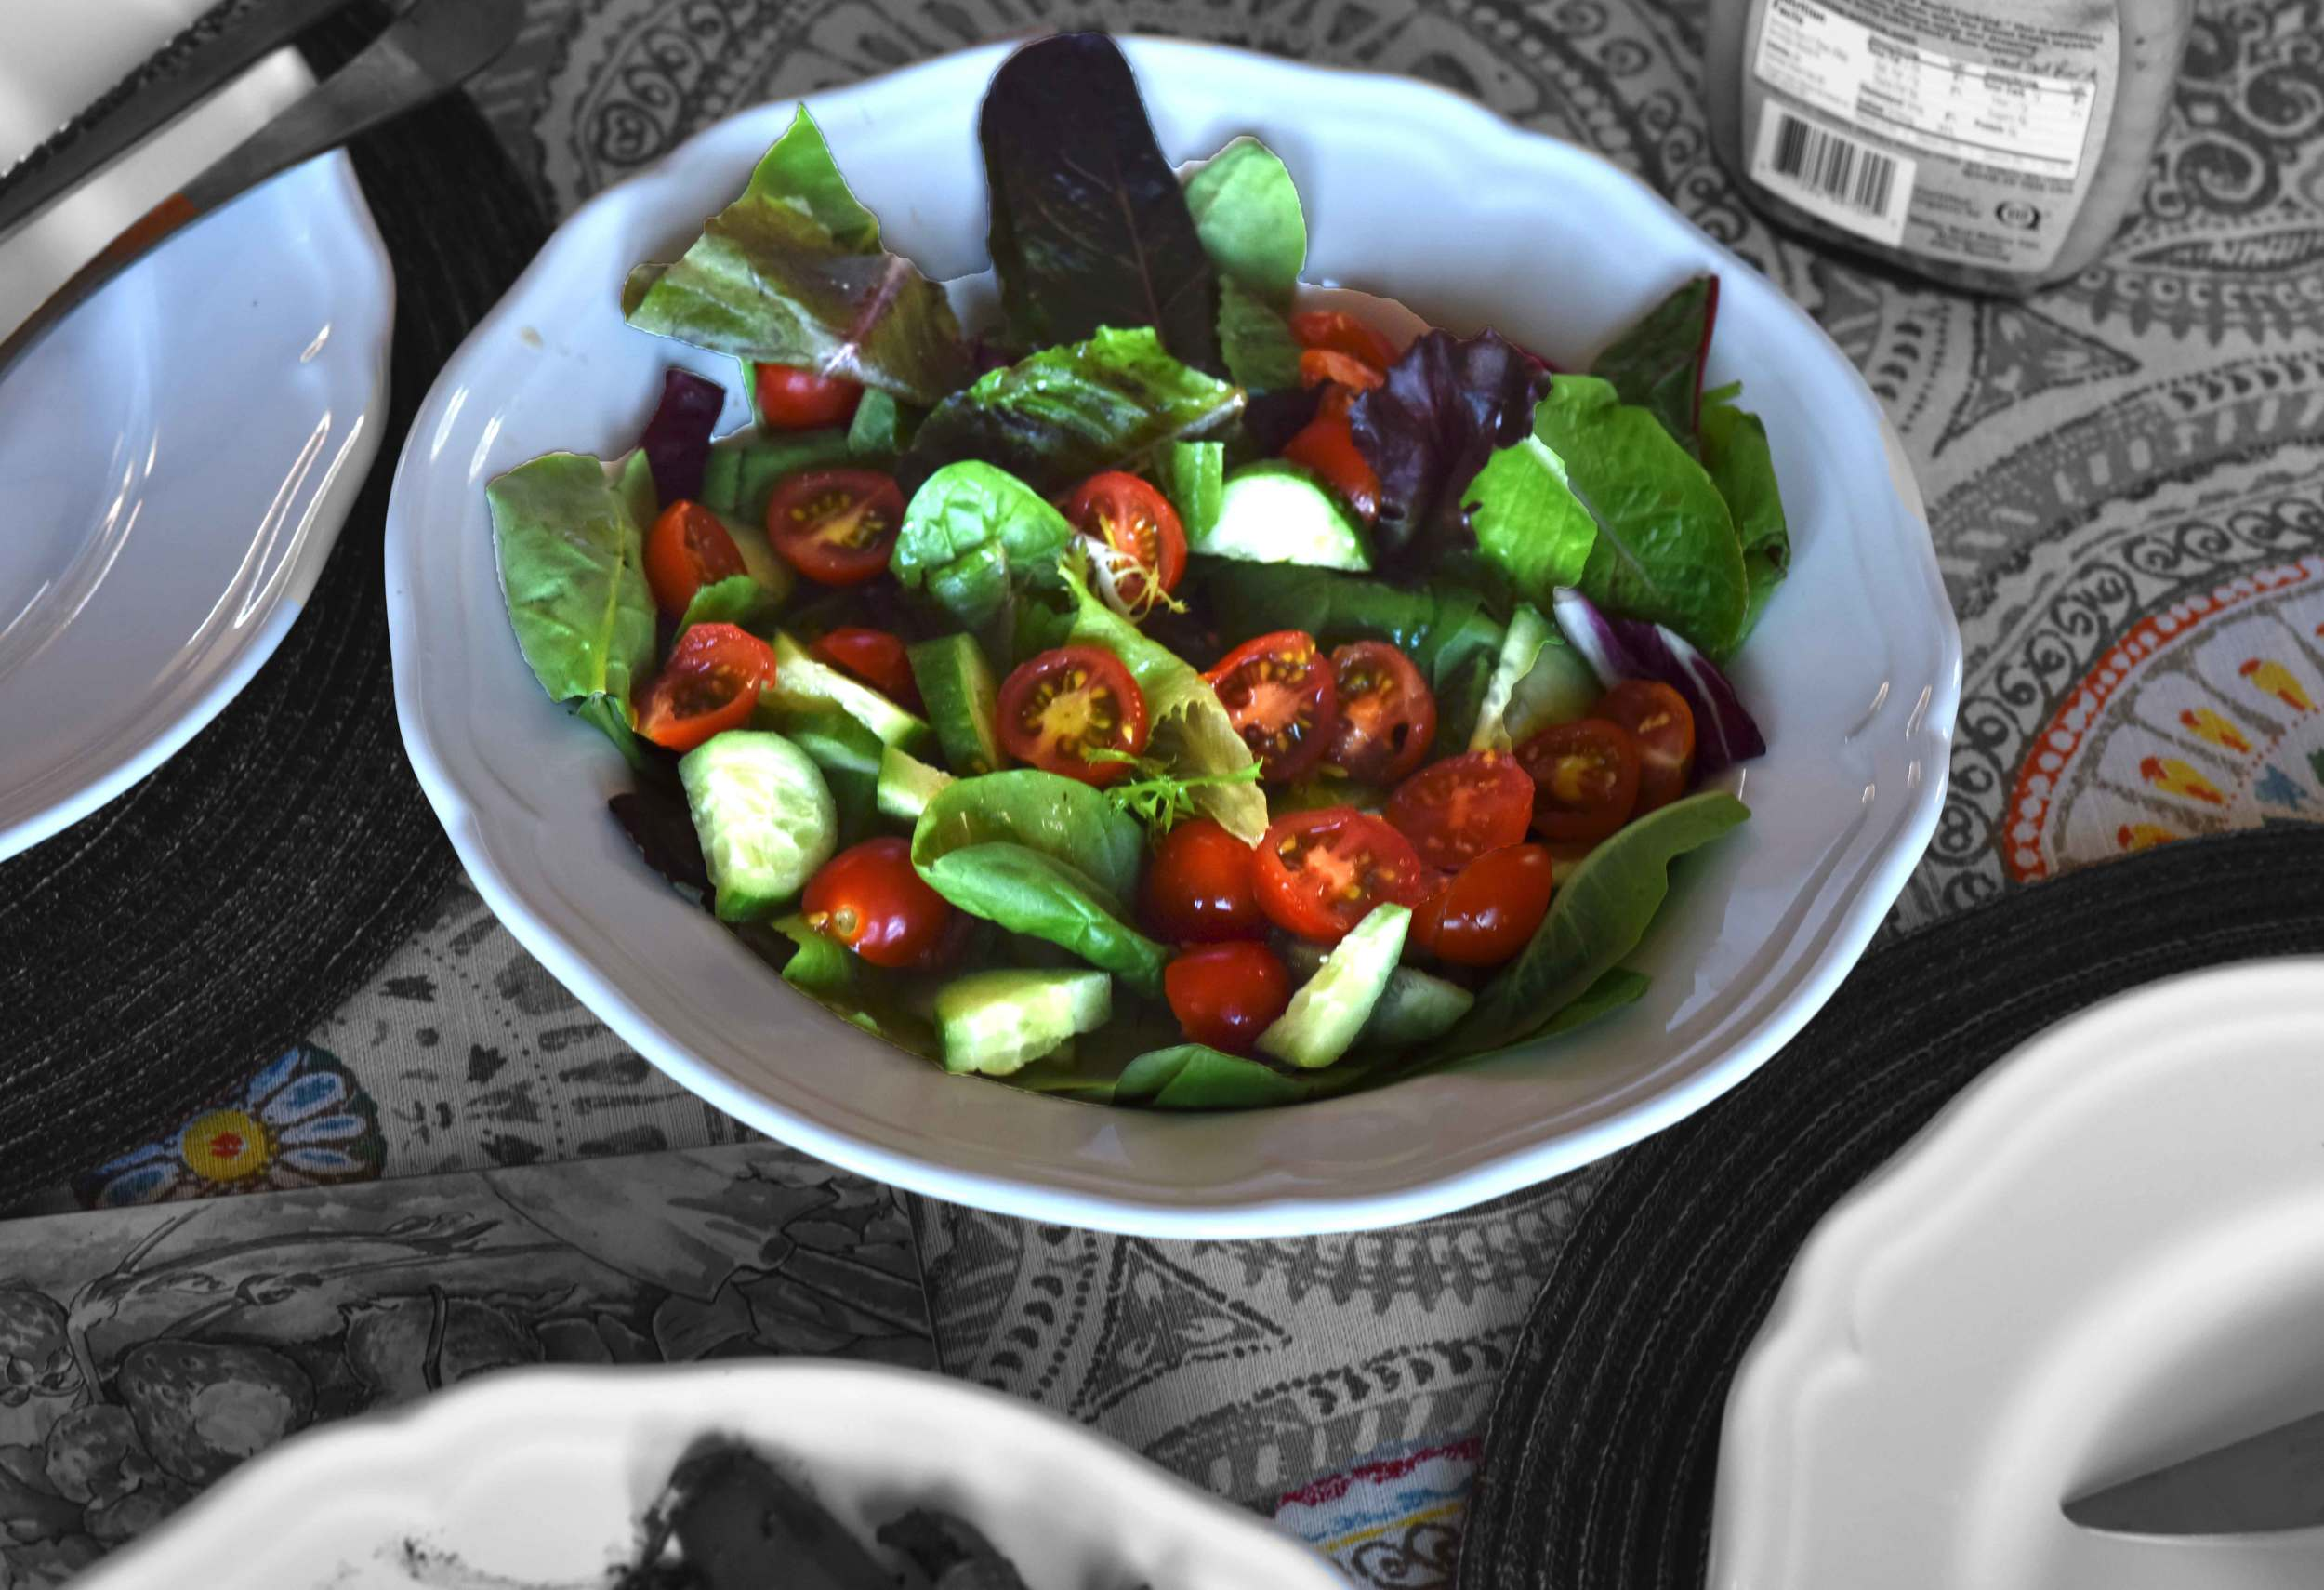 Salads for lunch, image©gunjanvirk